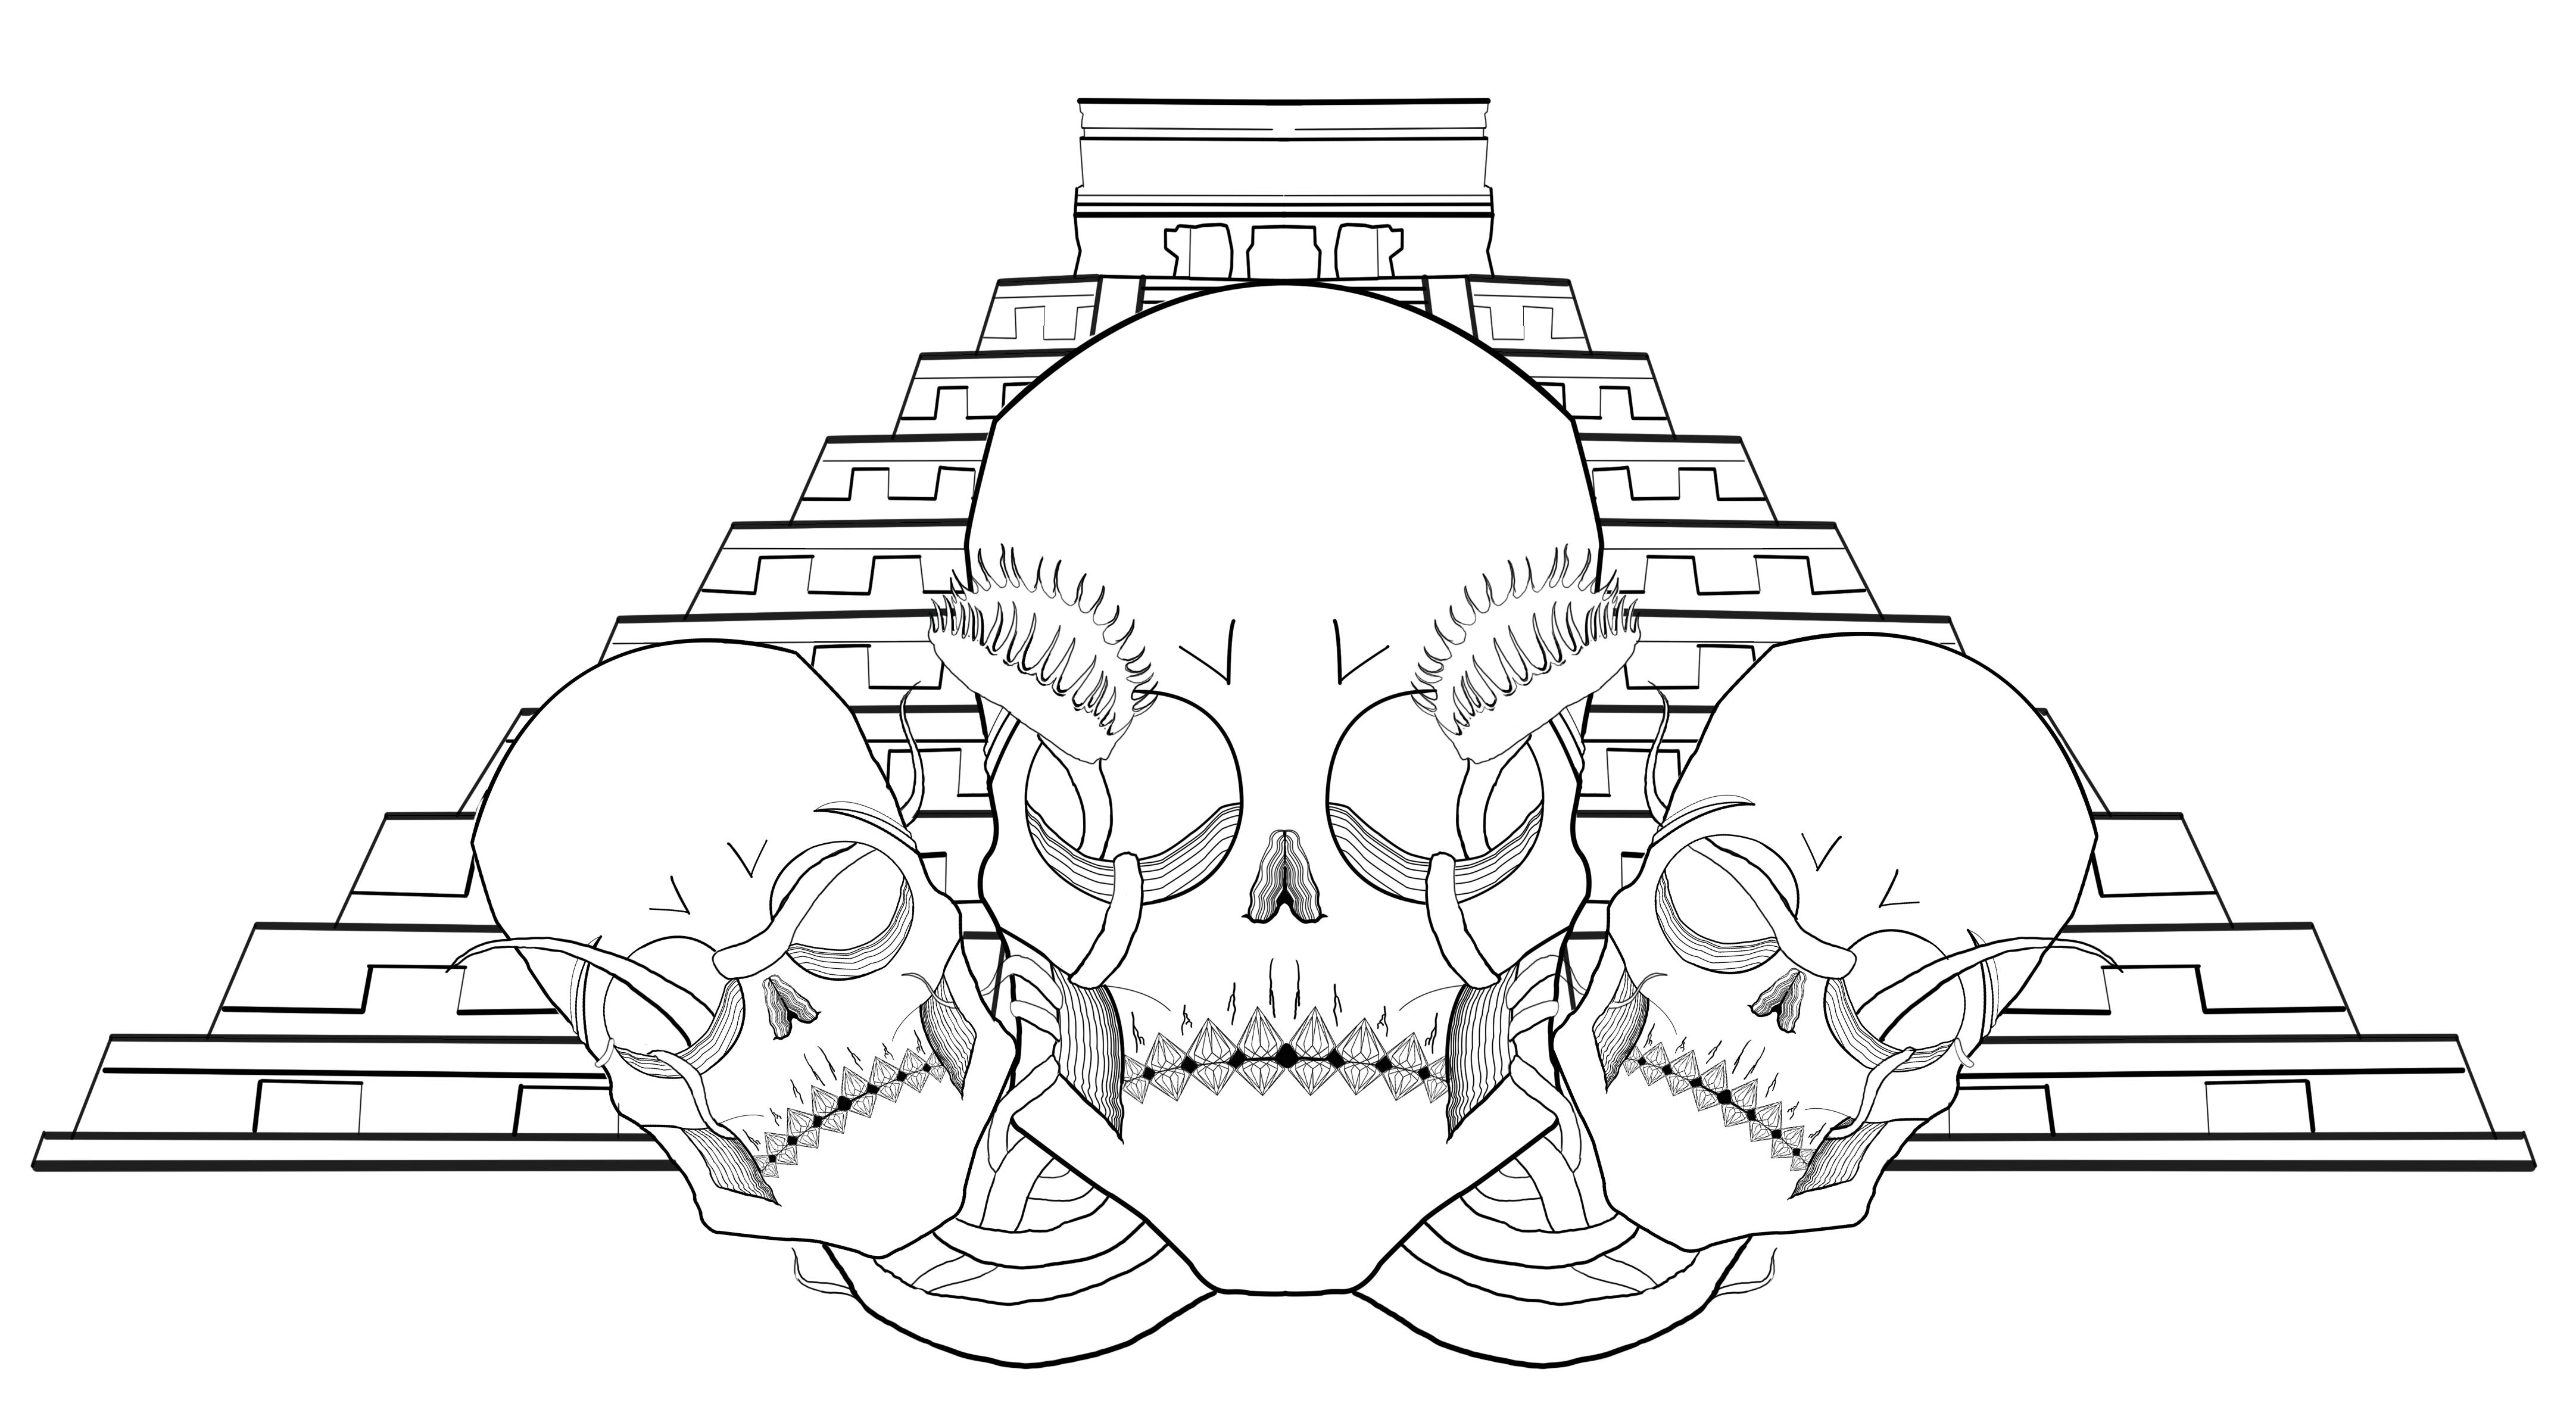 Mayan Temple Design